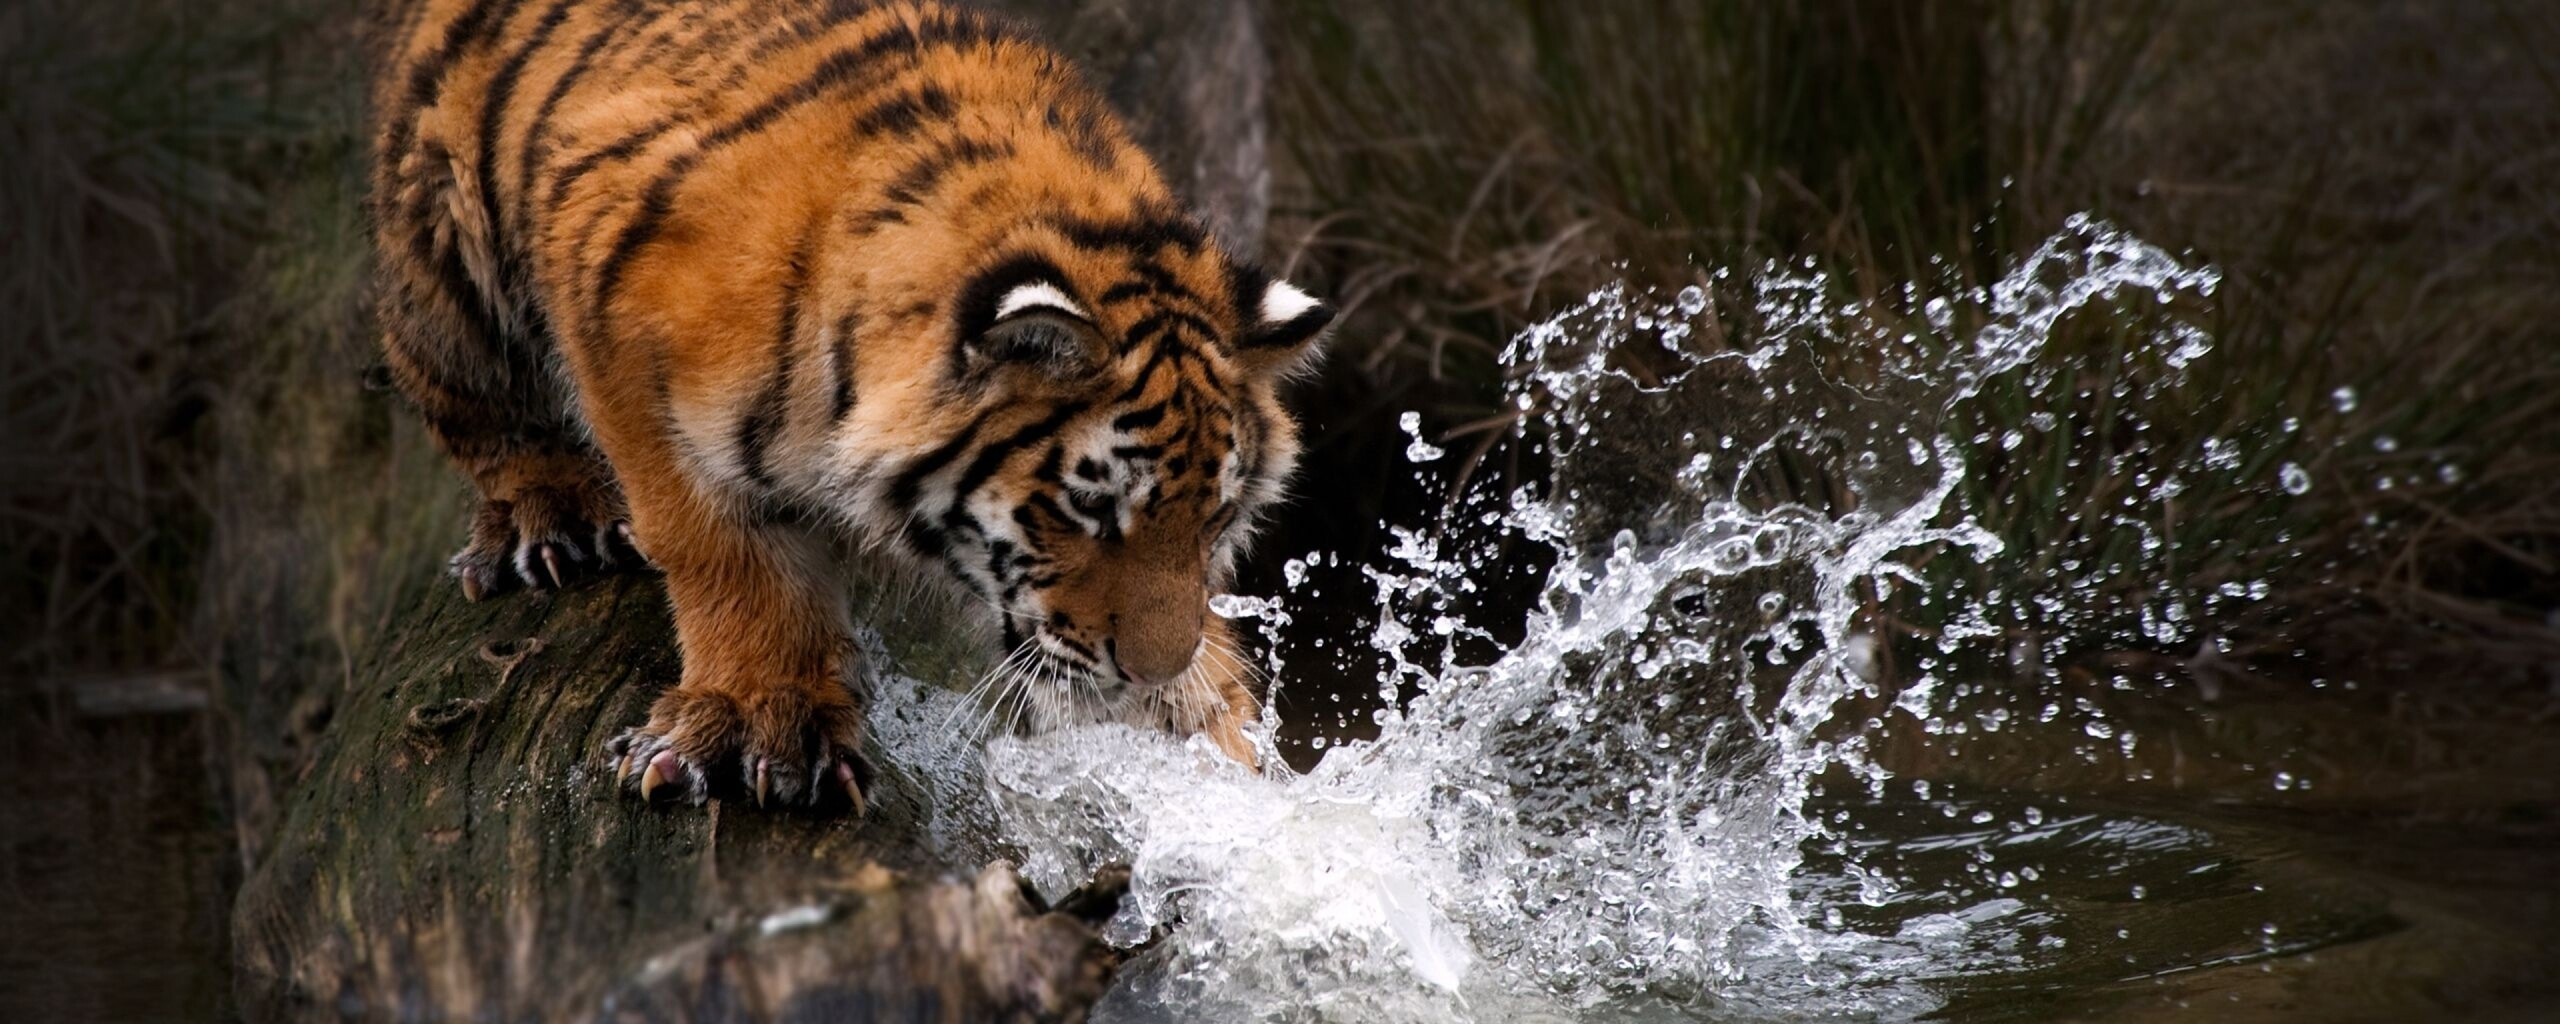 tiger-water-4k-ws.jpg